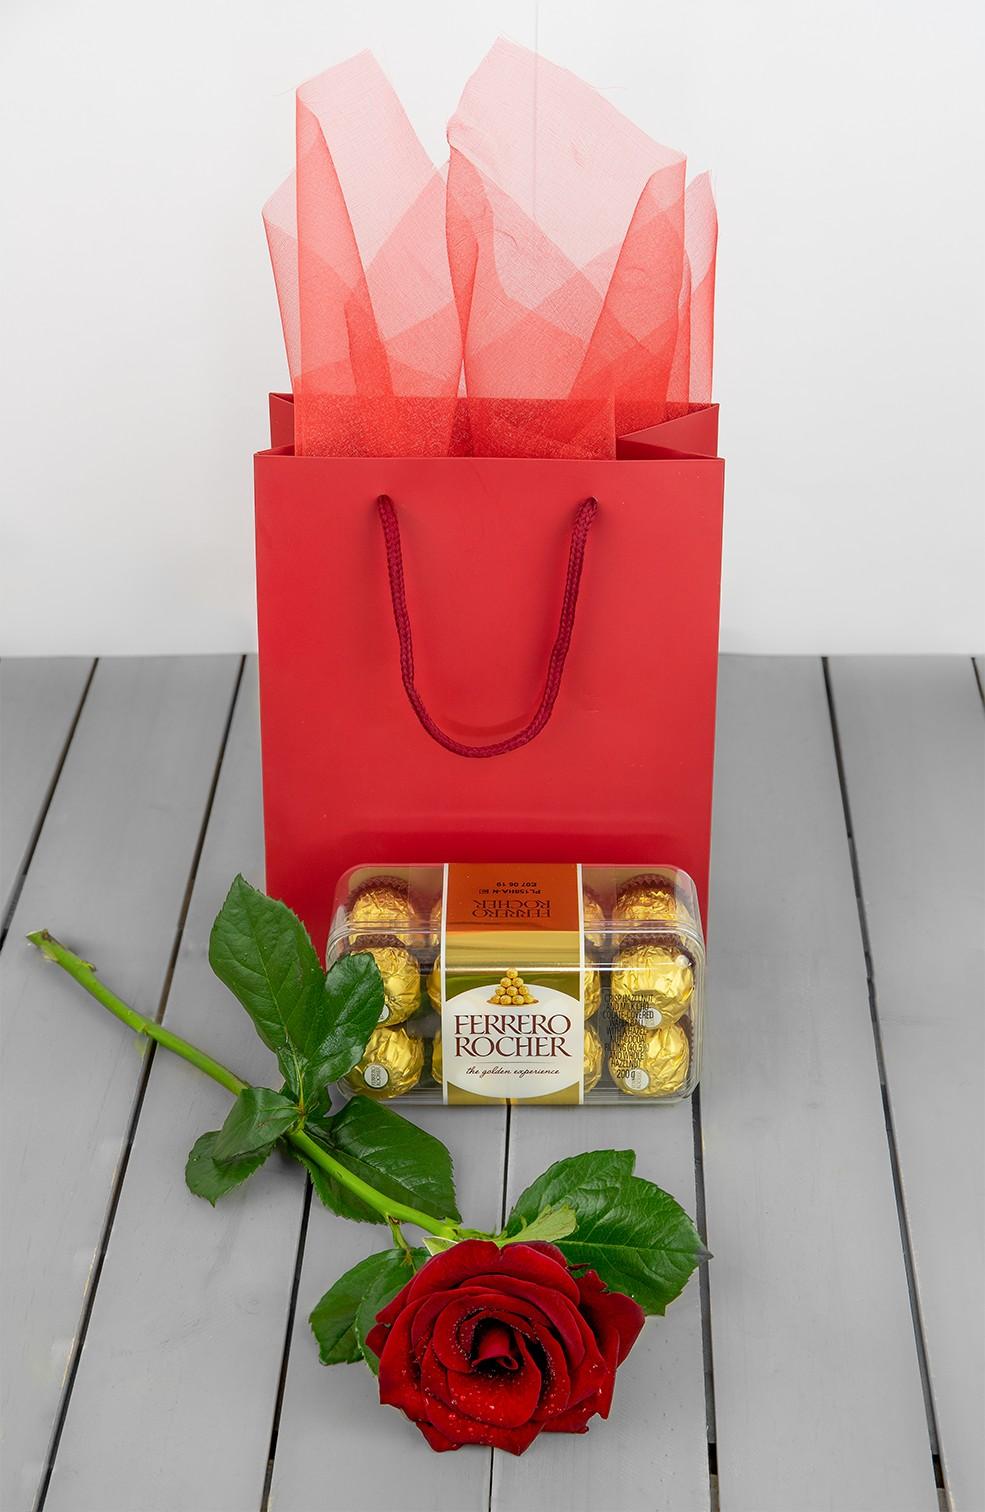 Ferrero Rocher Chocolate And Gift Bag Plus Rose